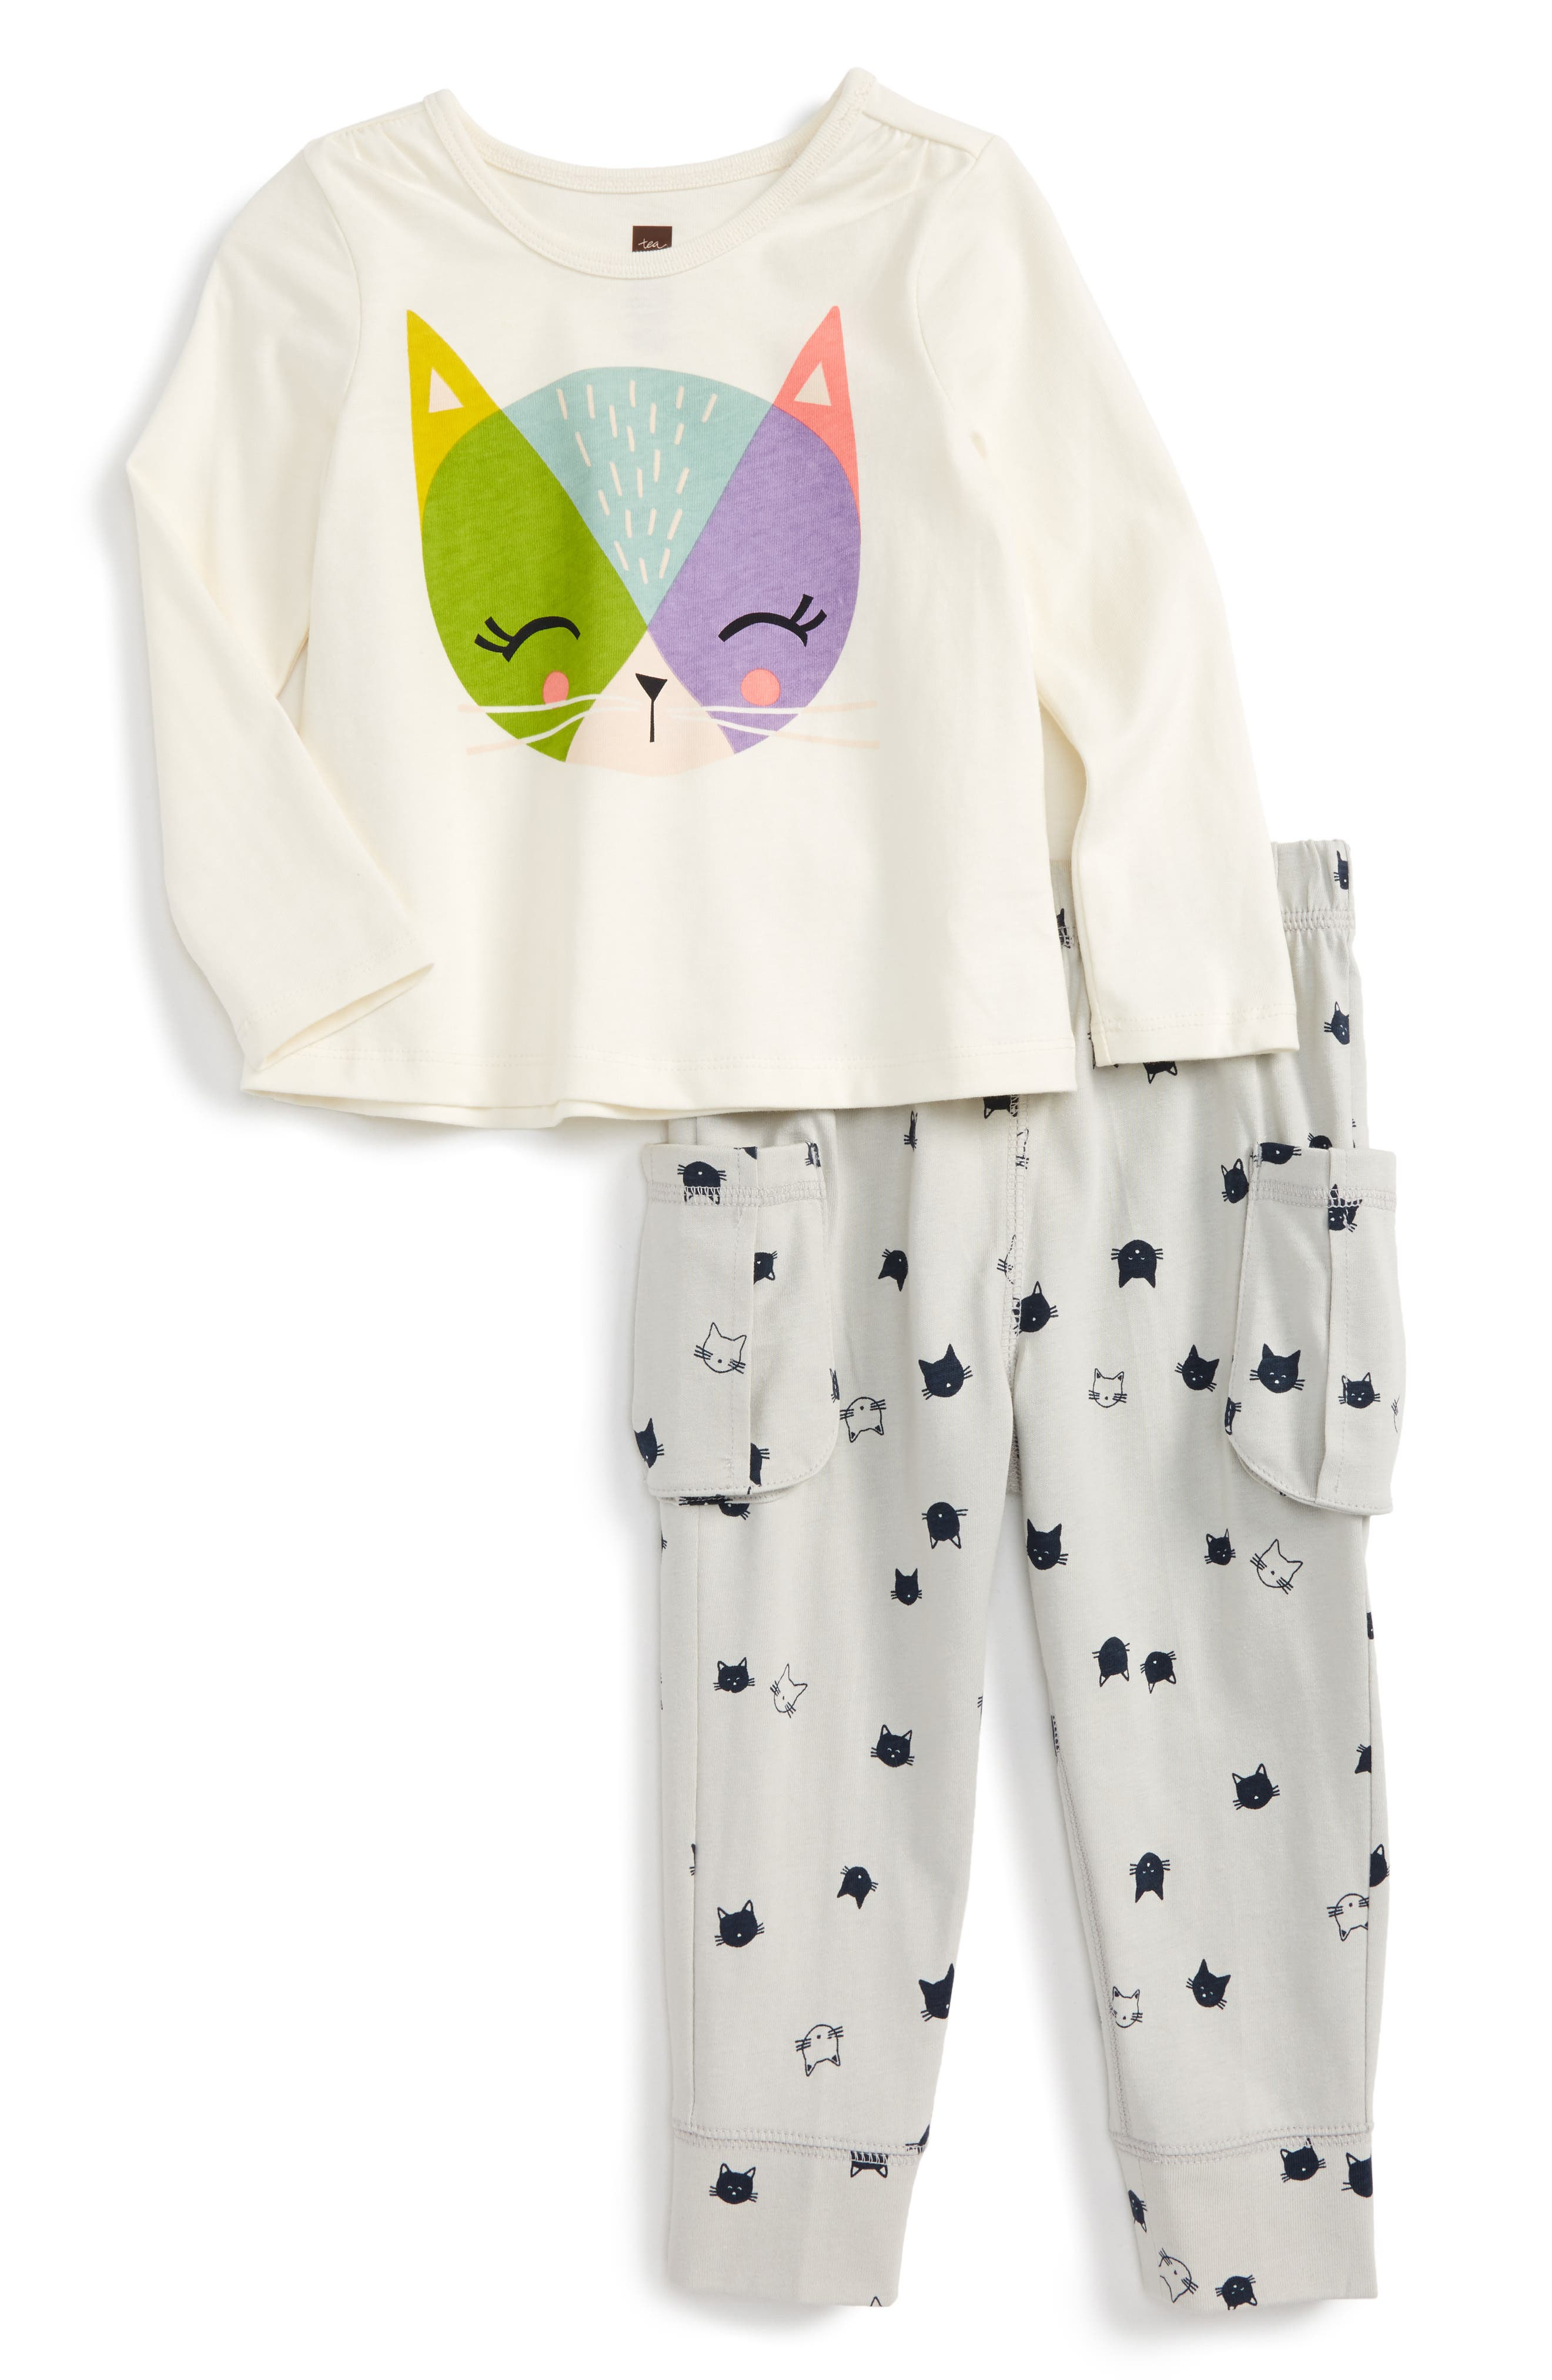 Hamish McHamish Graphic Top & Sweatpants,                             Main thumbnail 1, color,                             Chalk